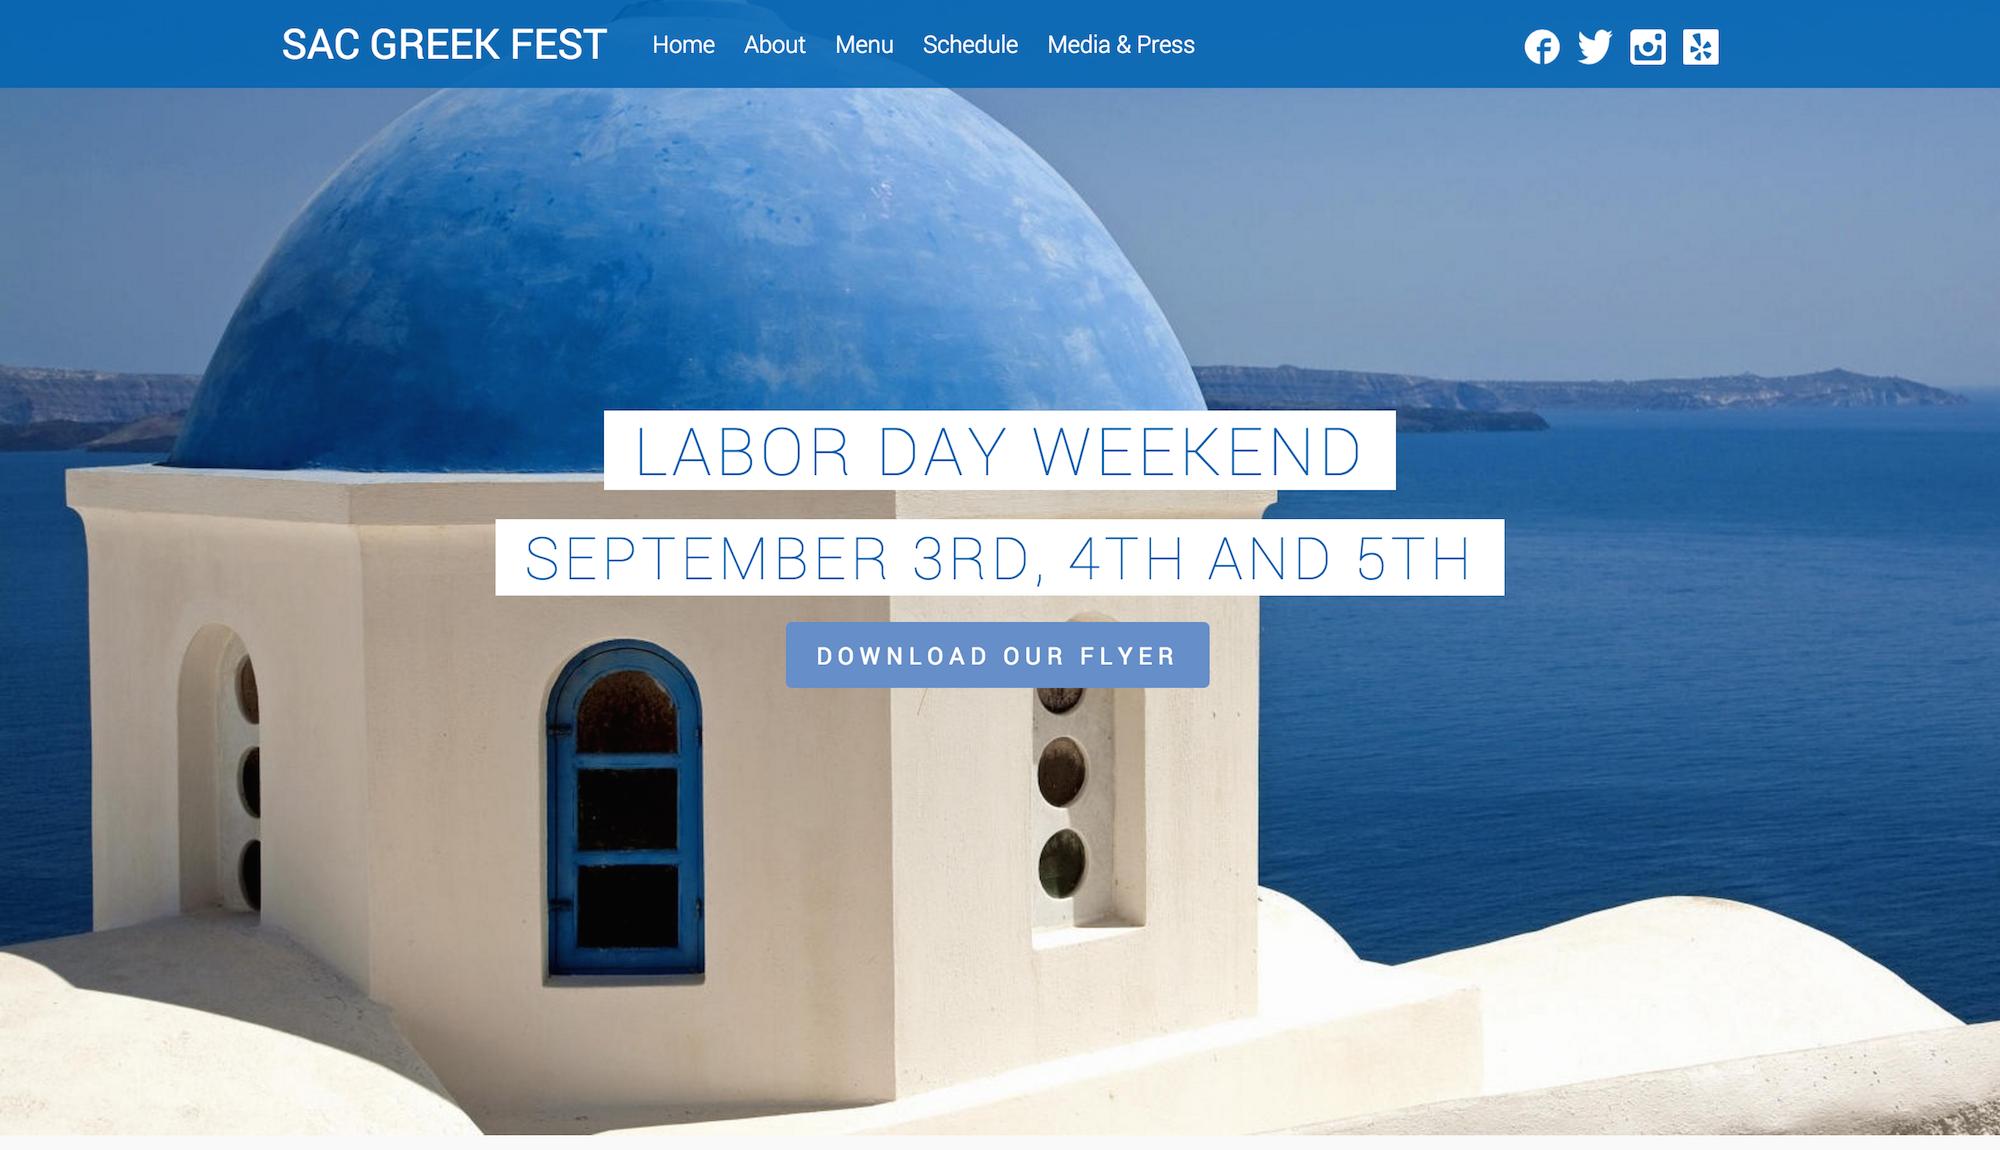 Home – SAC GREEK FEST